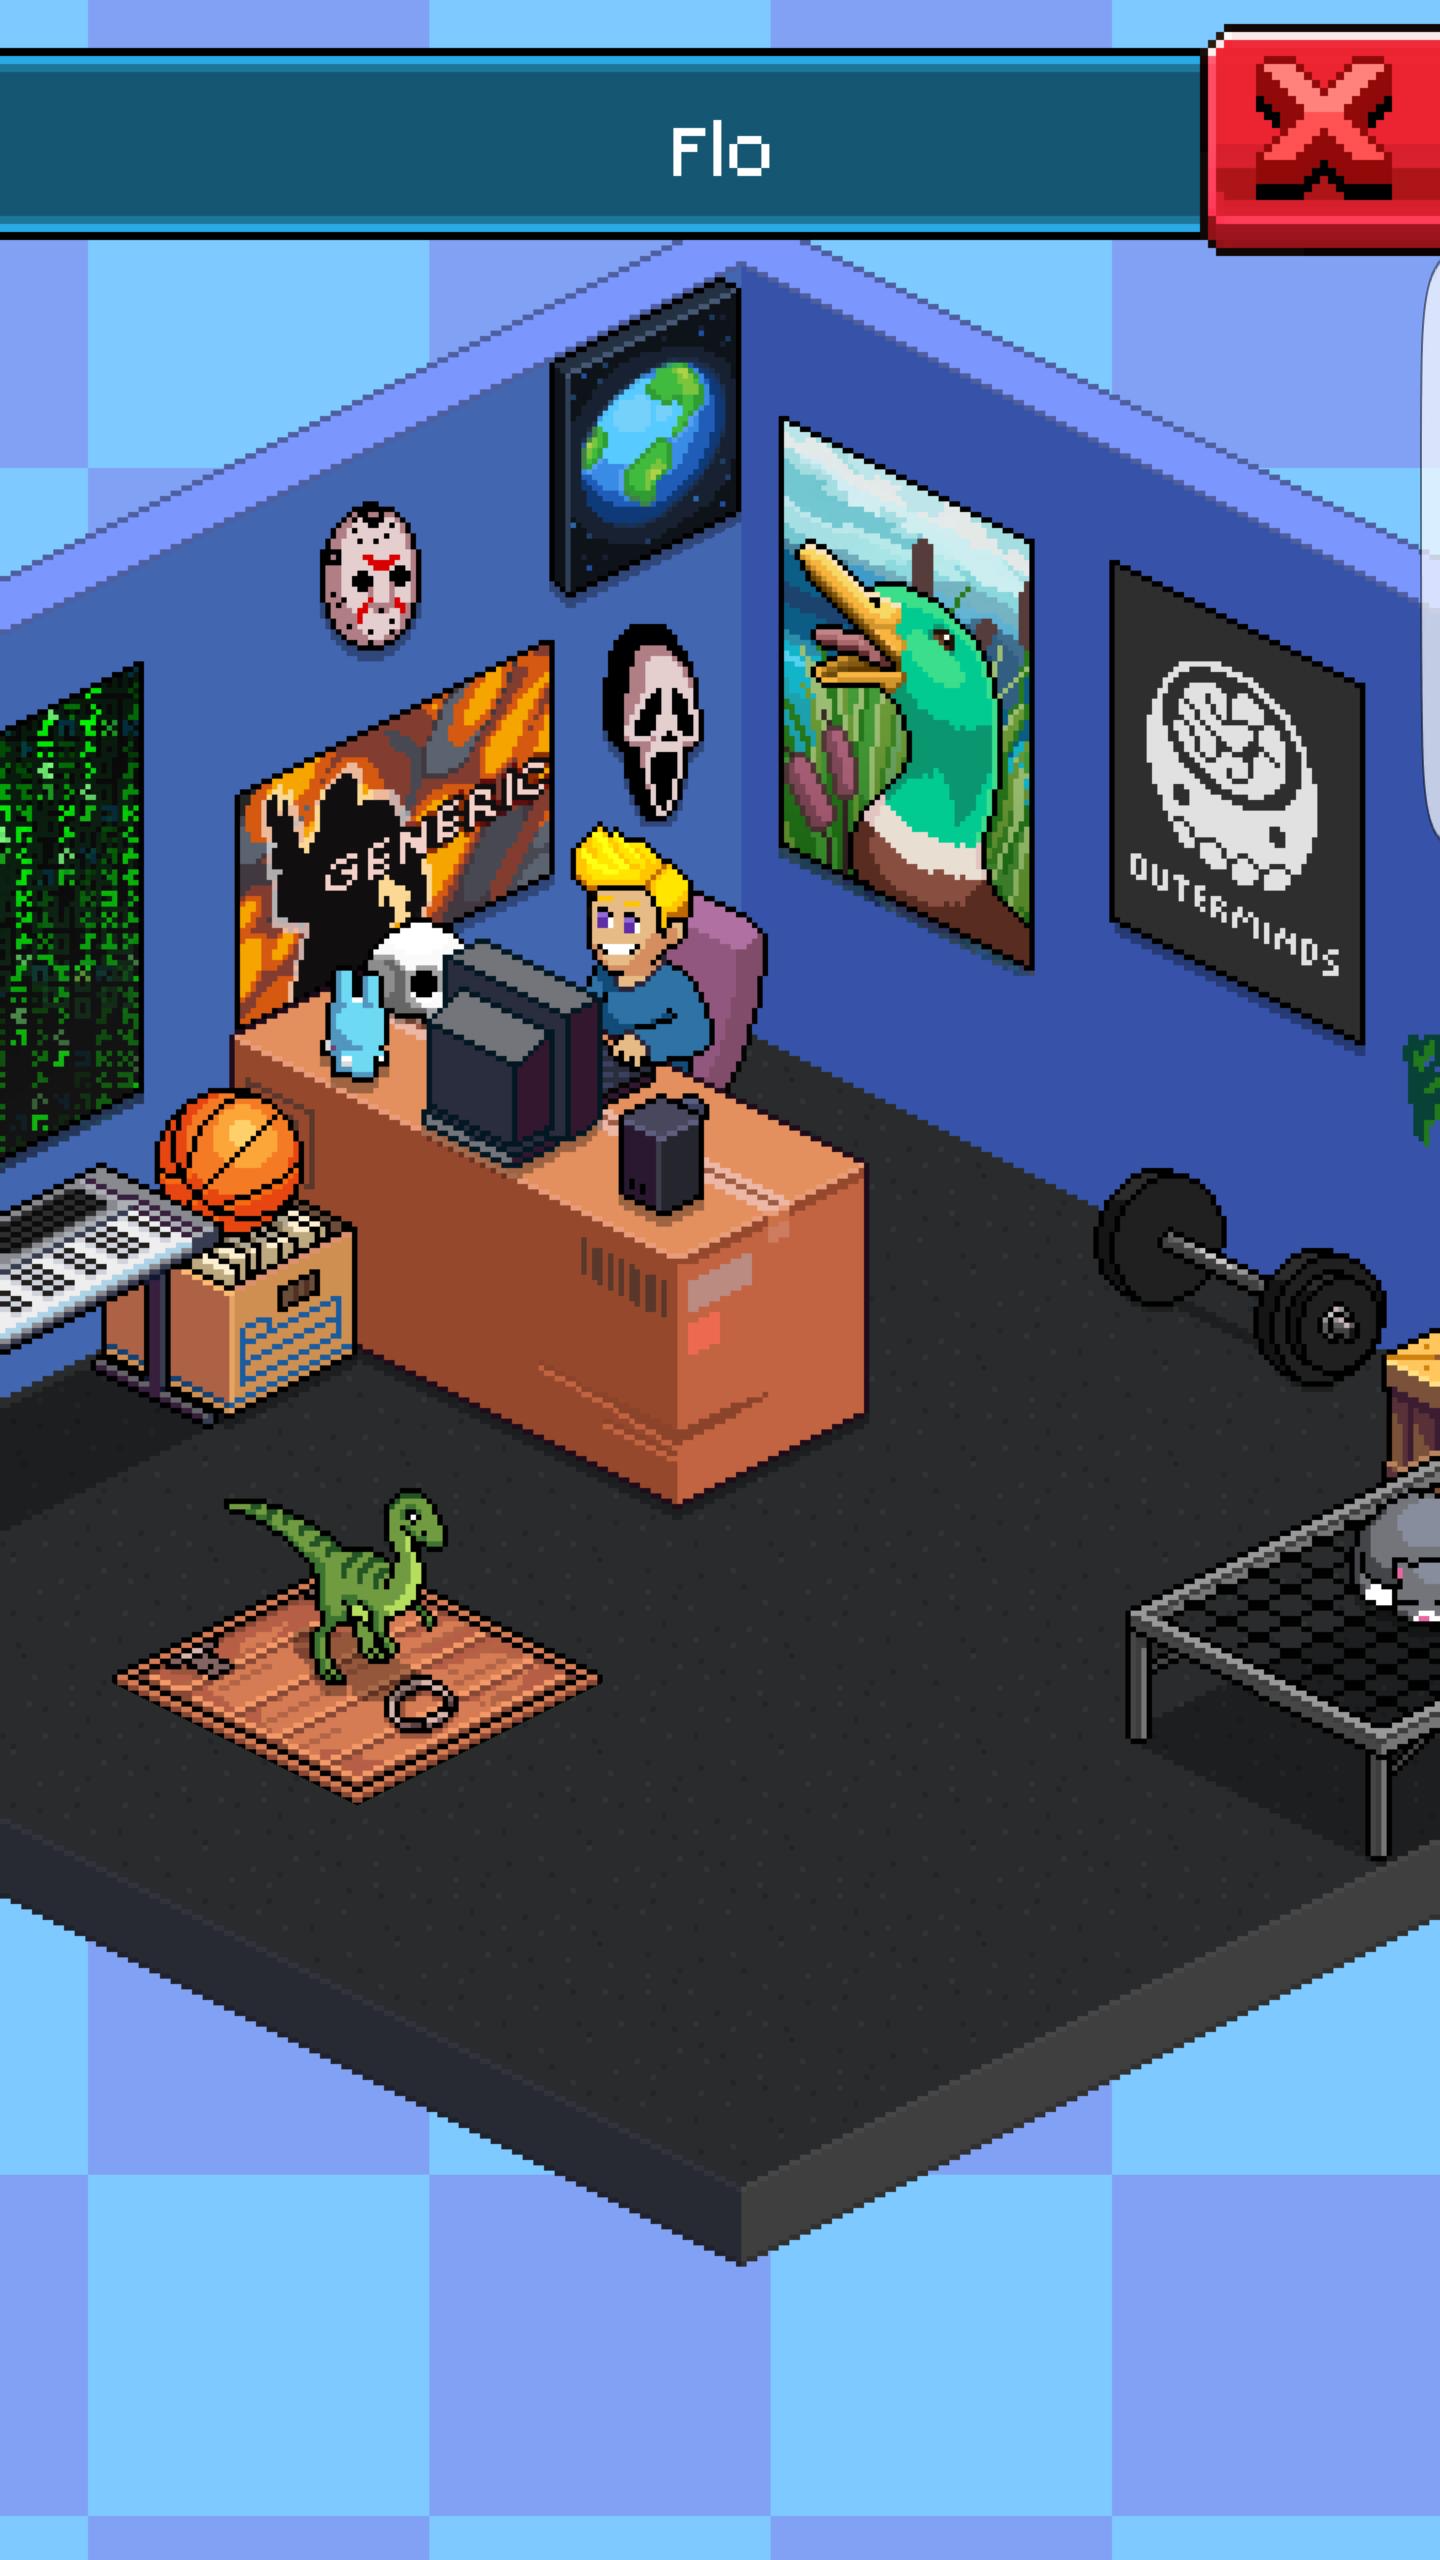 pewdiepies-tuber-simulator-android-9